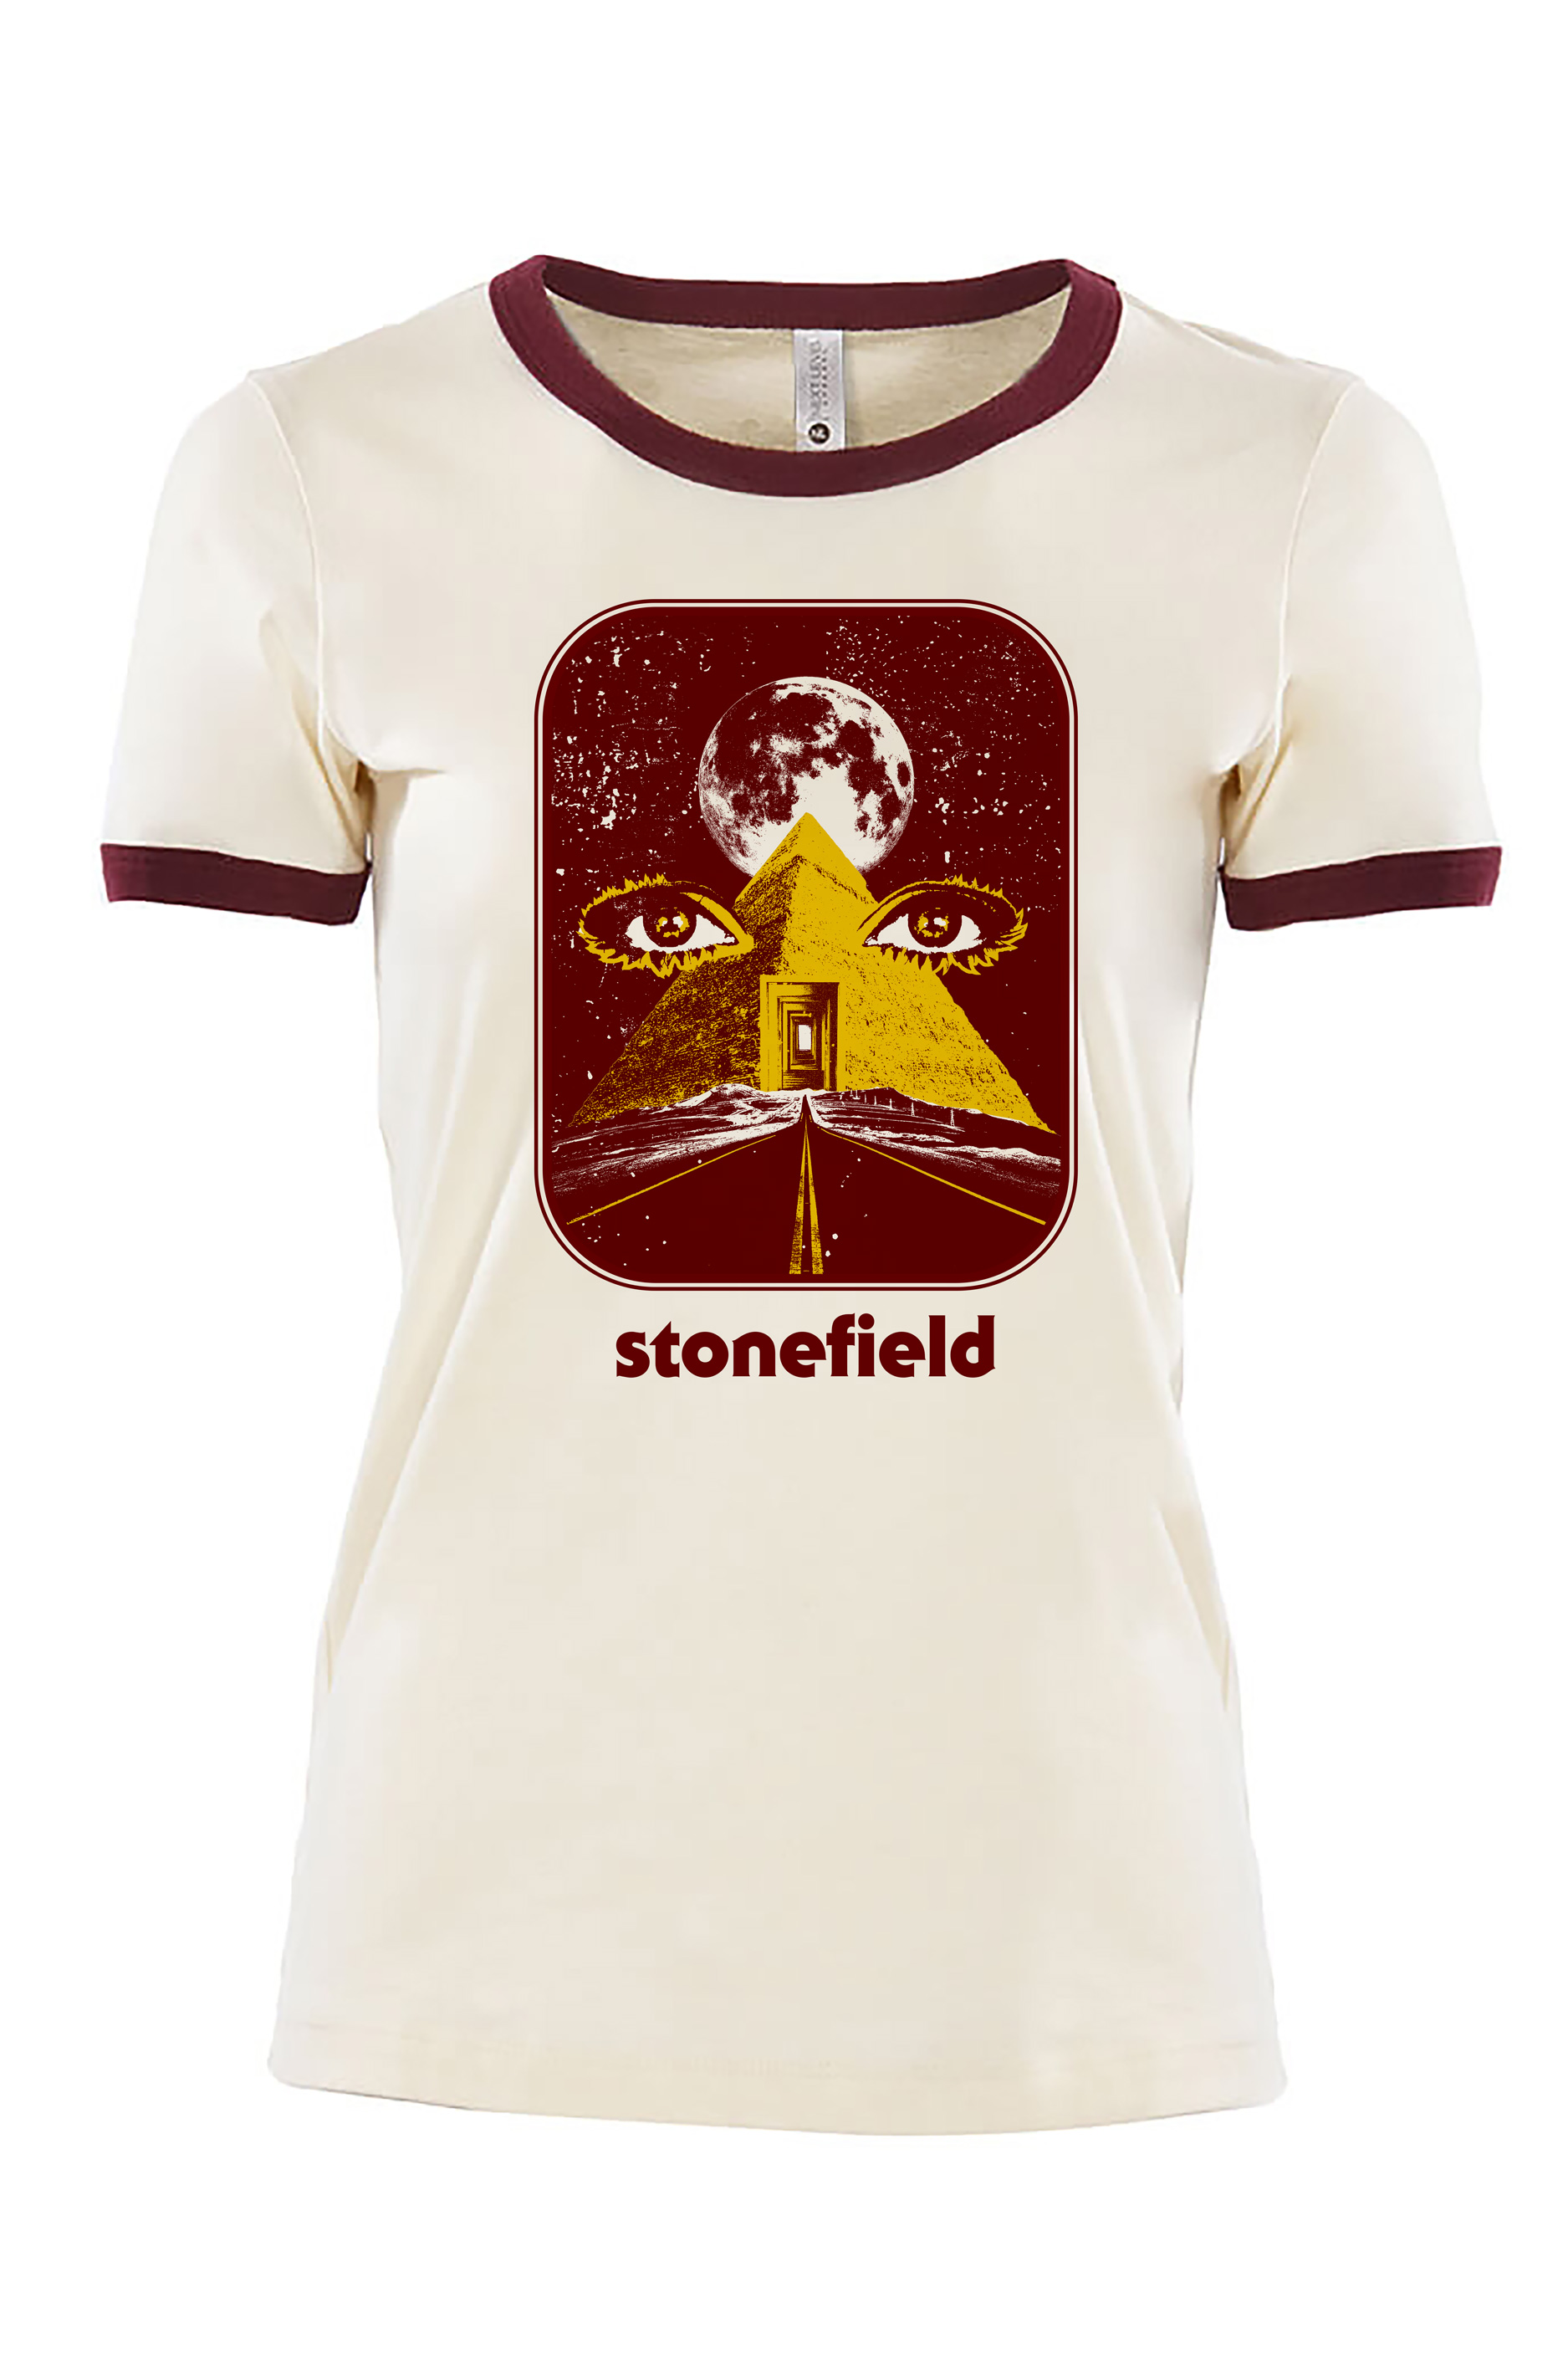 Stonefield-Tee-Next-Level-Natural-Maroon-Ringer.jpg